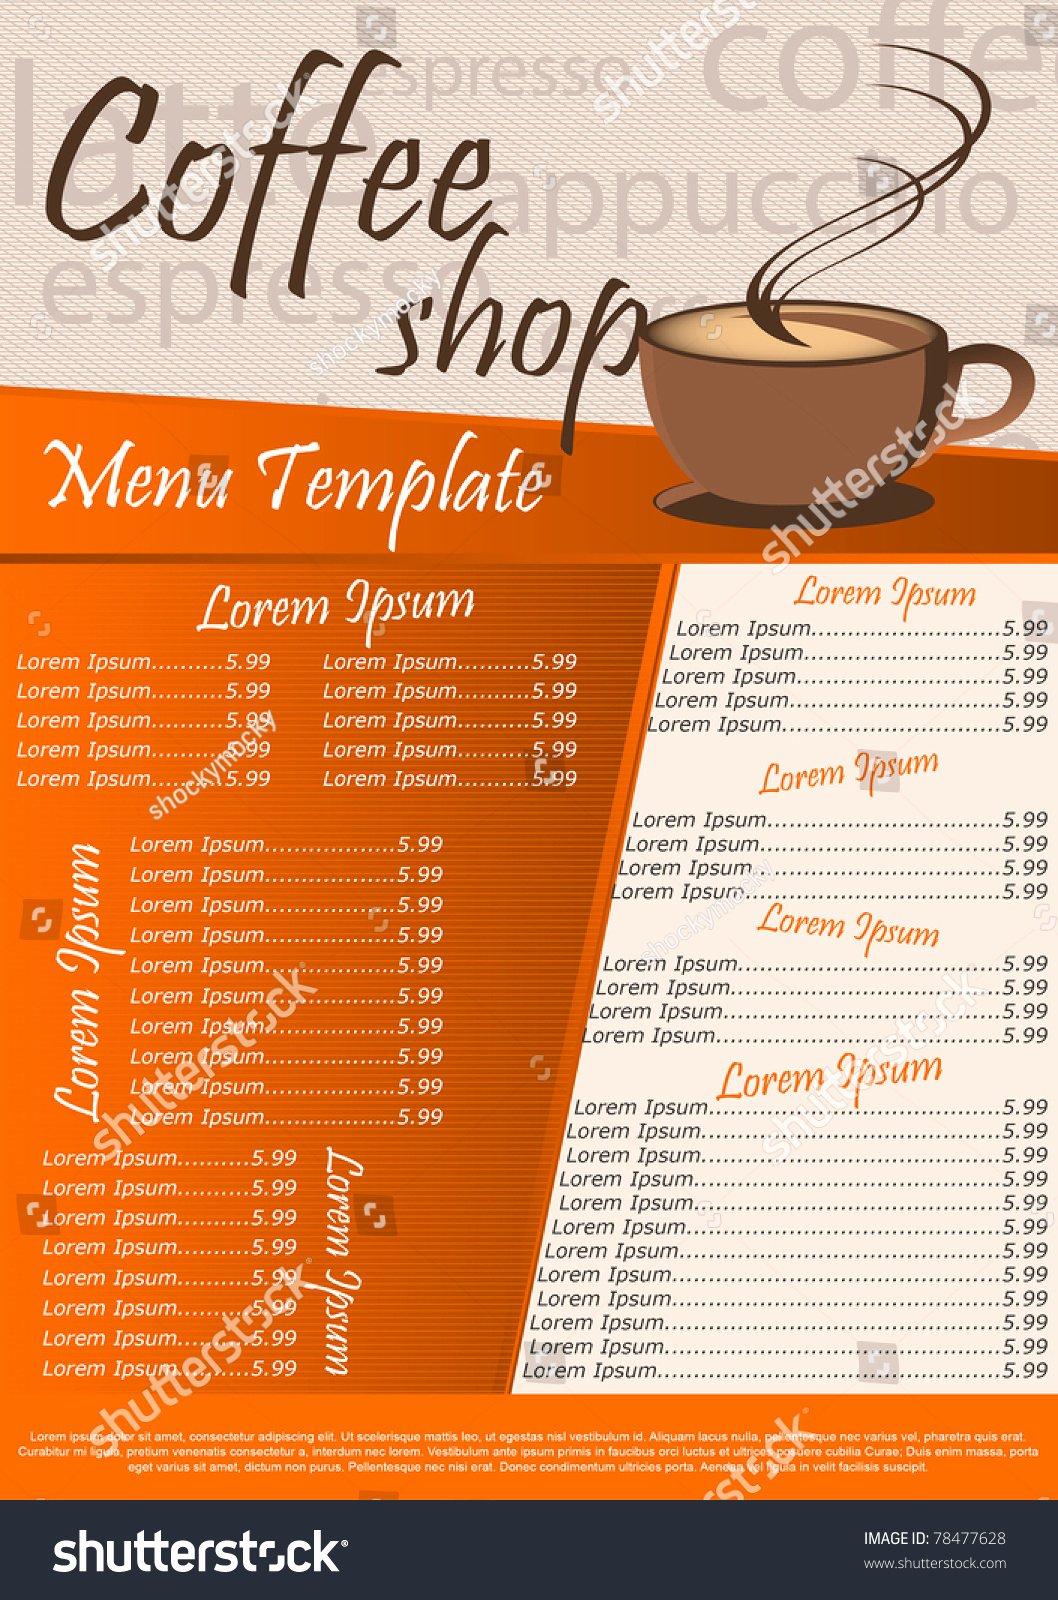 Coffee Shop Menu Template Beautiful Coffee Shop Menu Template Vector Illustration Stock Vector